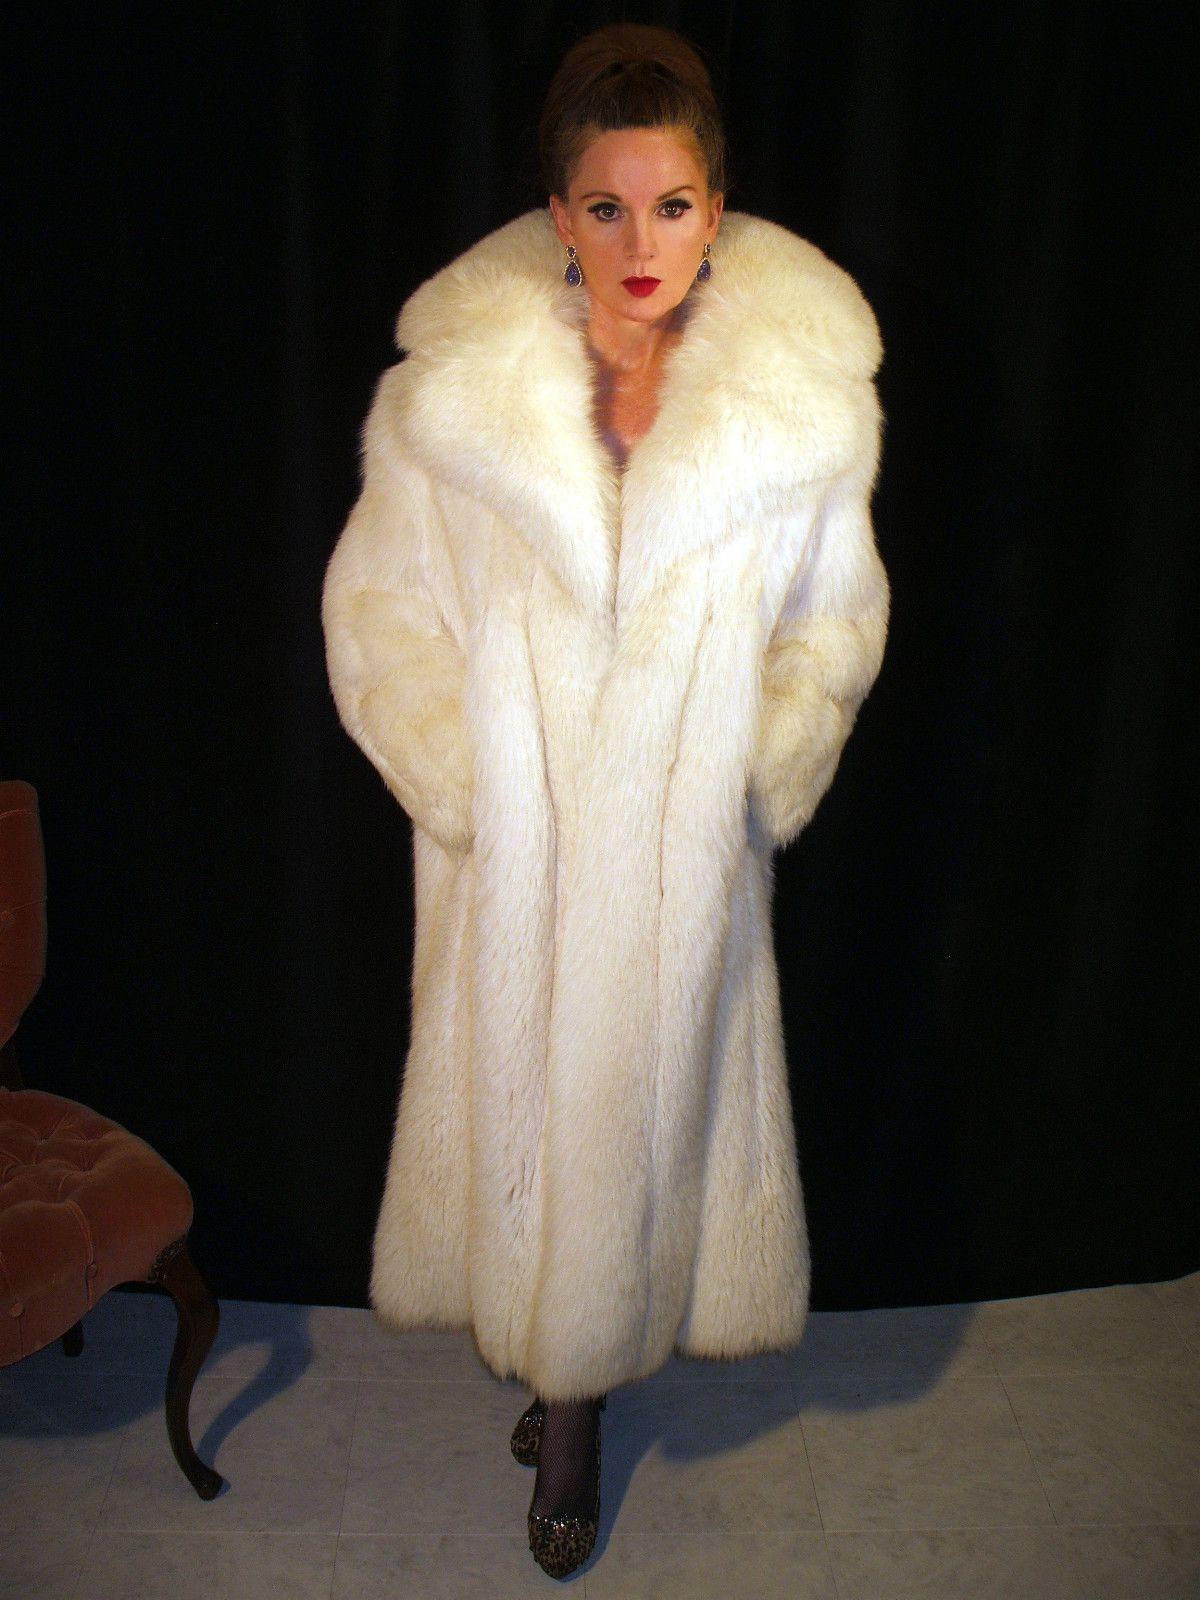 White fox fur - photo#2